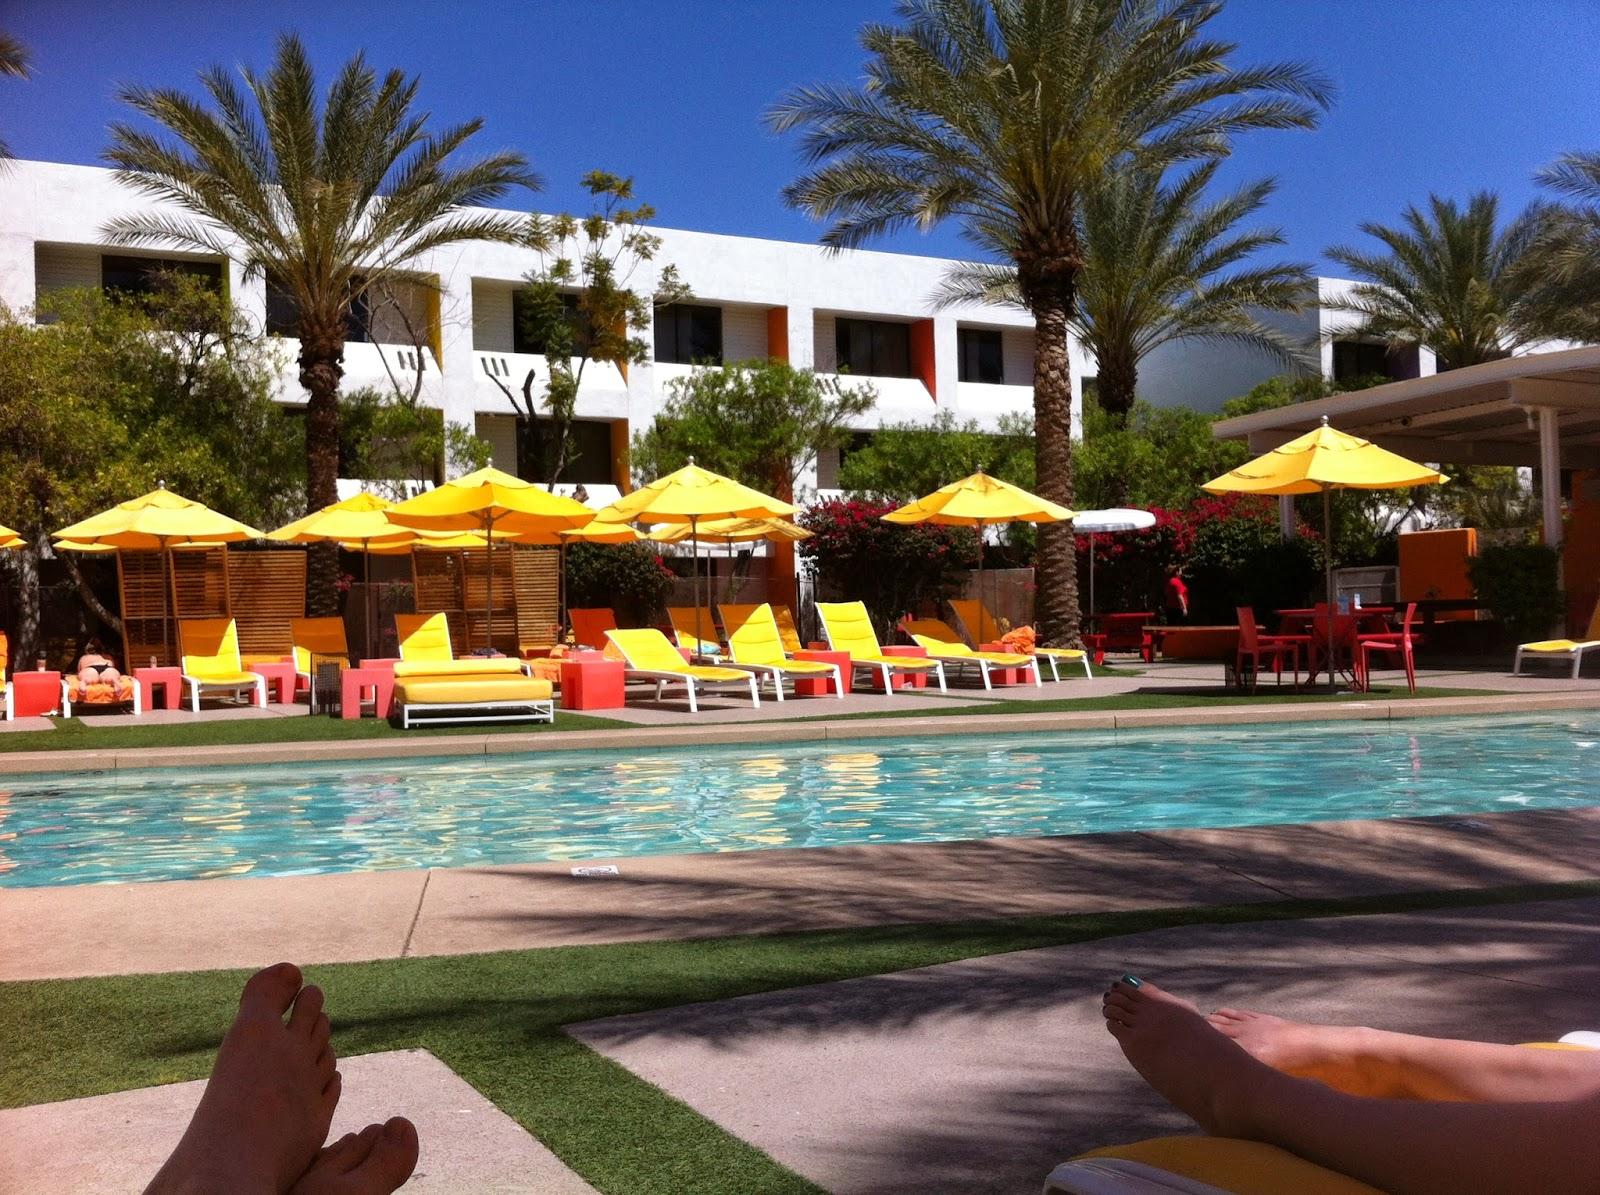 The Saguaro Hotel Scottsdale